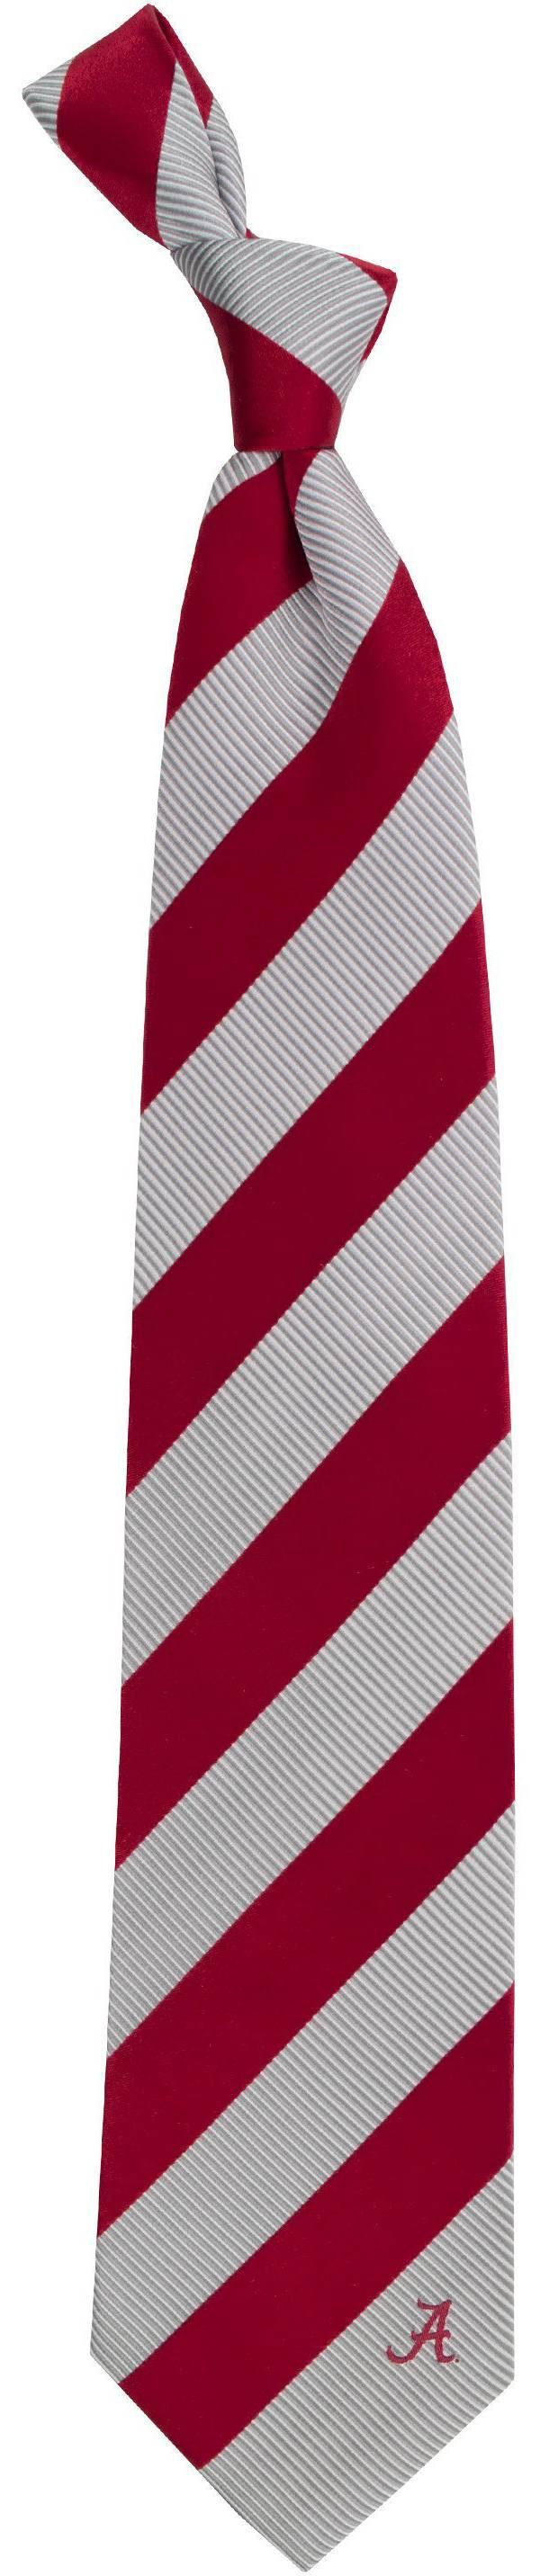 Eagles Wings Alabama Crimson Tide Woven Silk Necktie product image